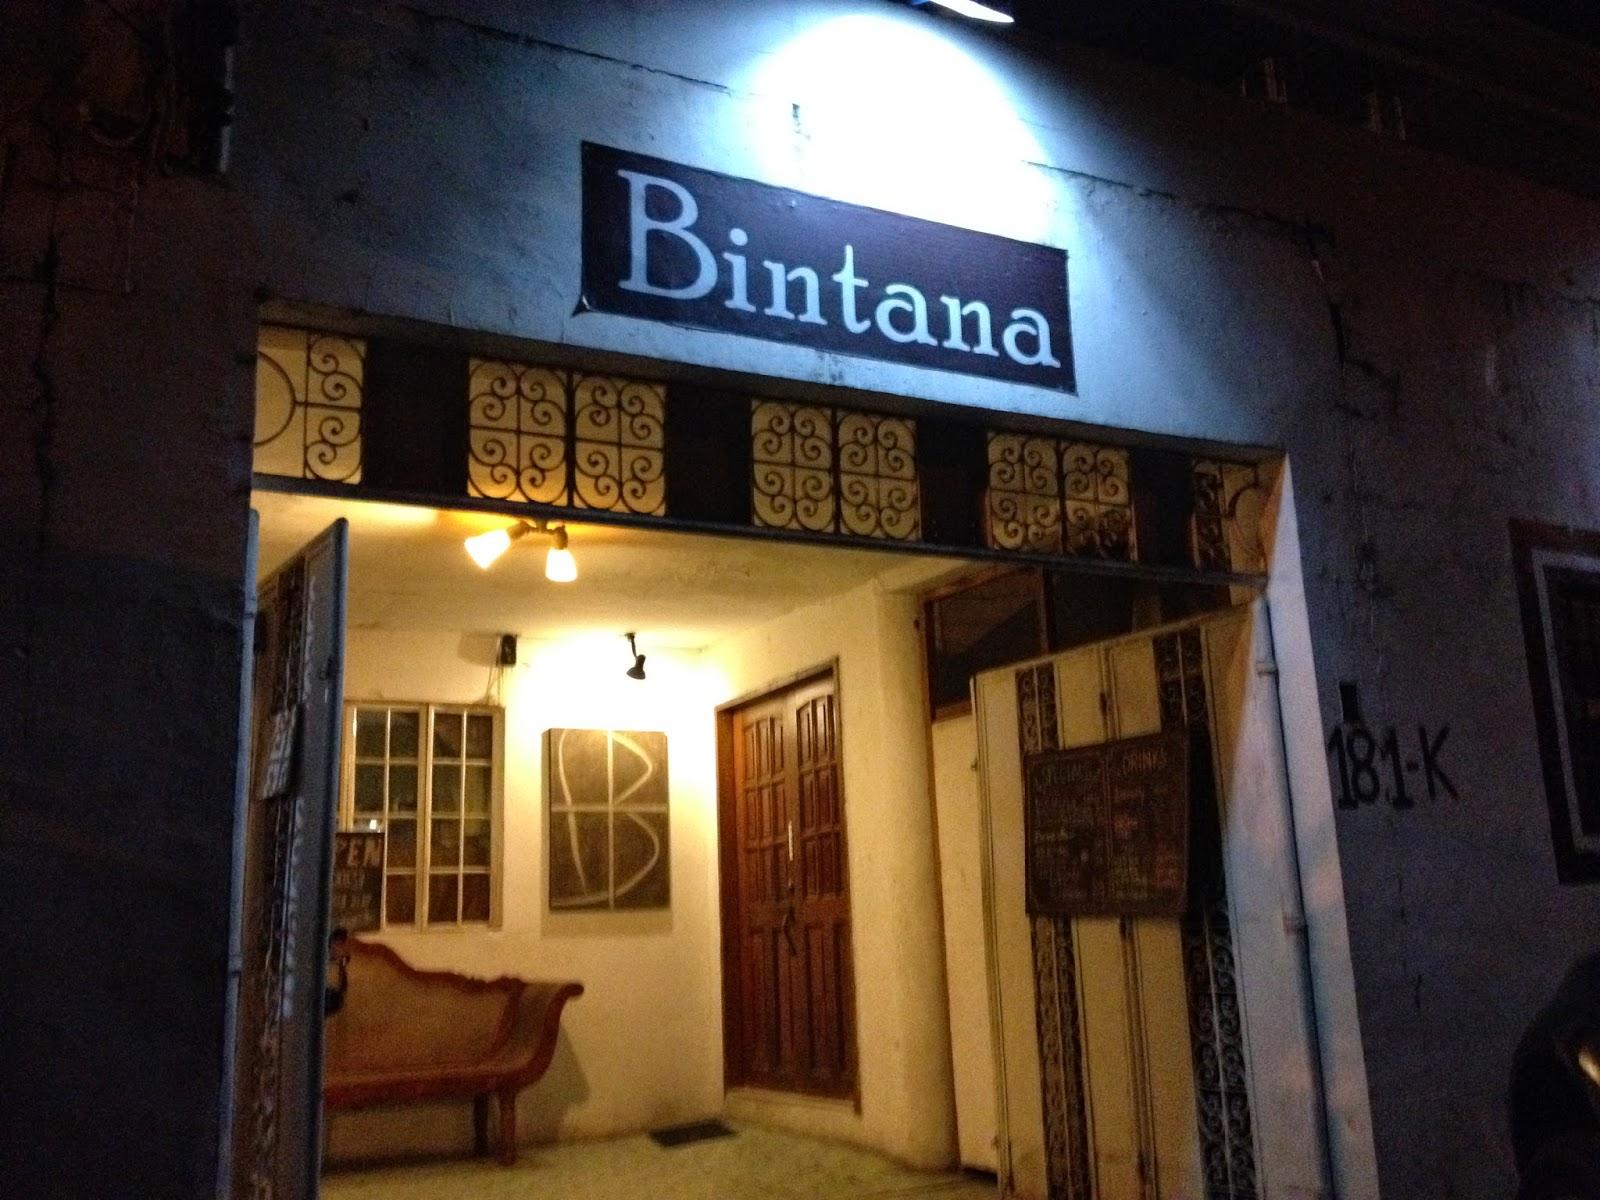 rad af - Review of Bintana Coffee House, Cebu City ...